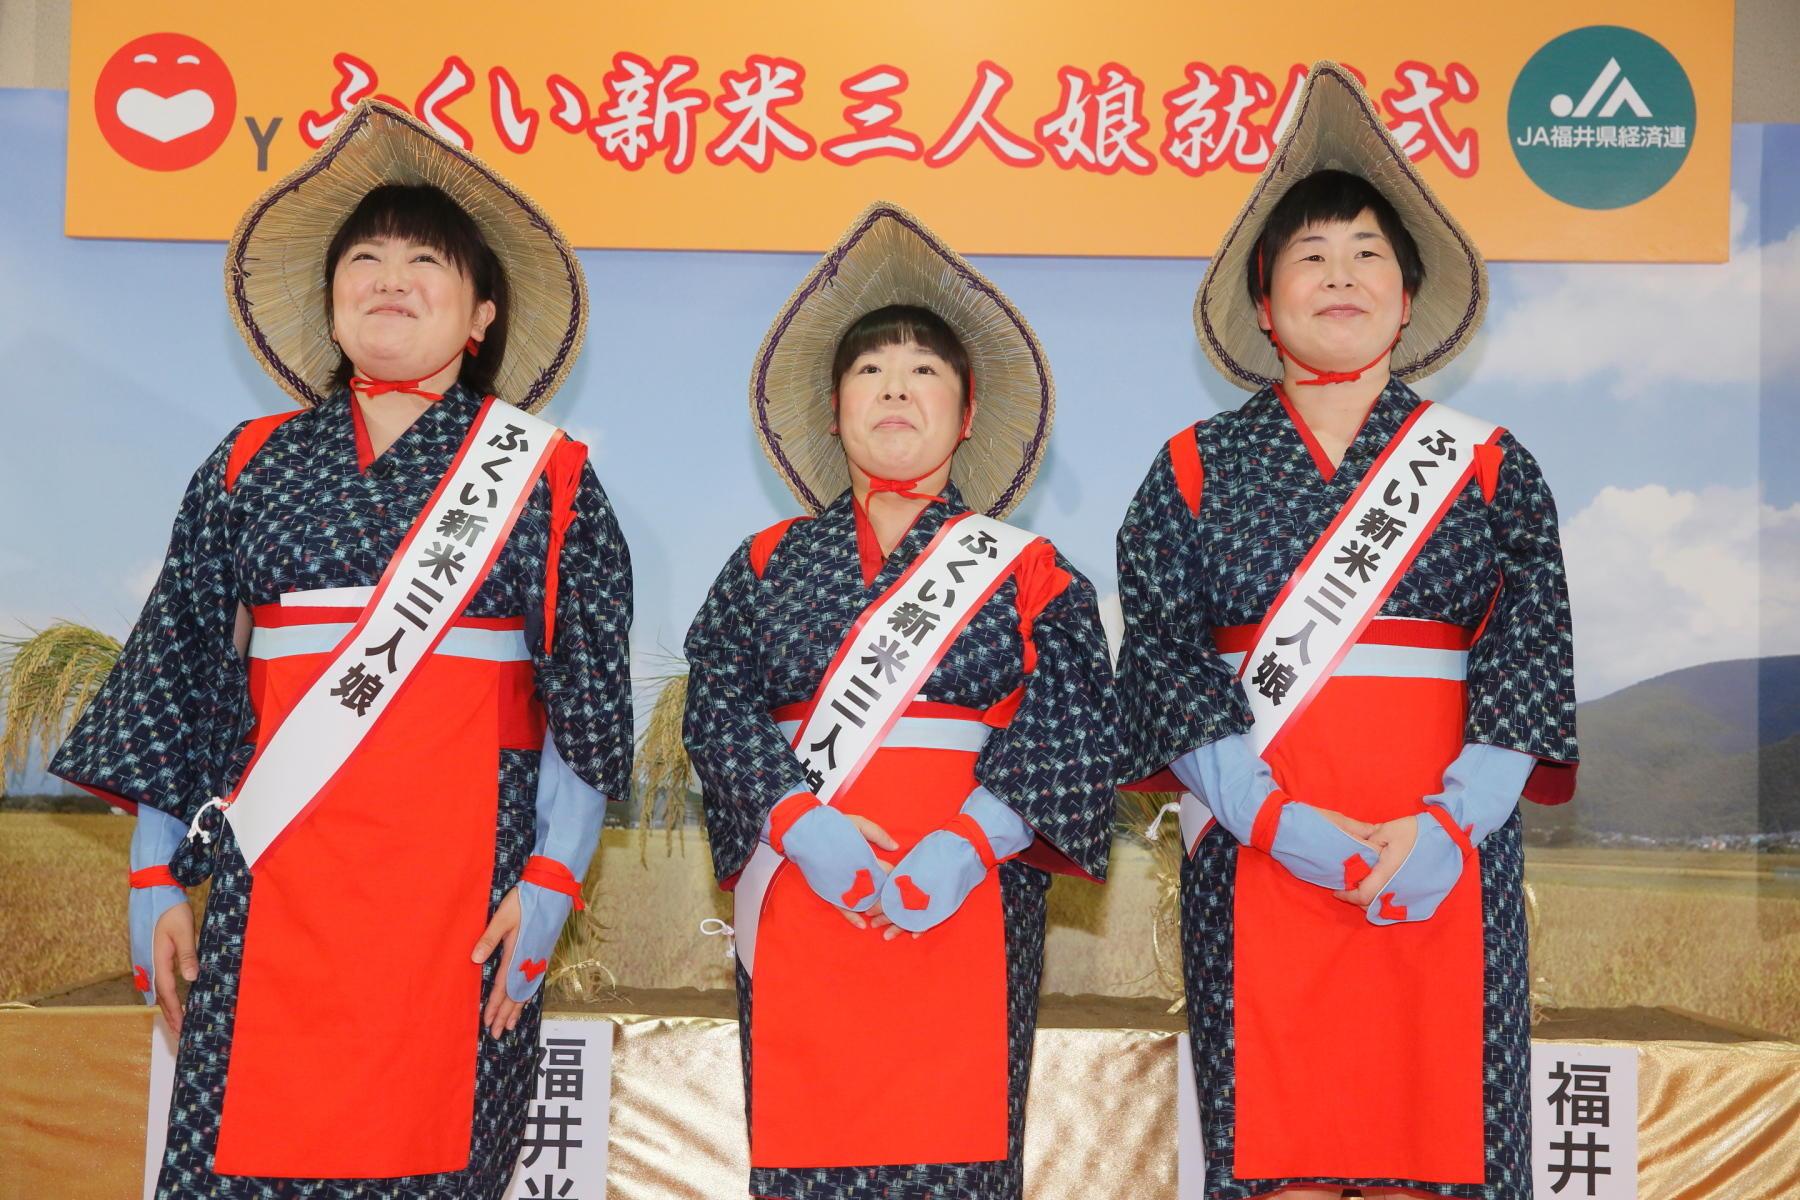 http://news.yoshimoto.co.jp/20160831143832-5a4da10cf9b10cd6885a80a90d71776243f83695.jpg